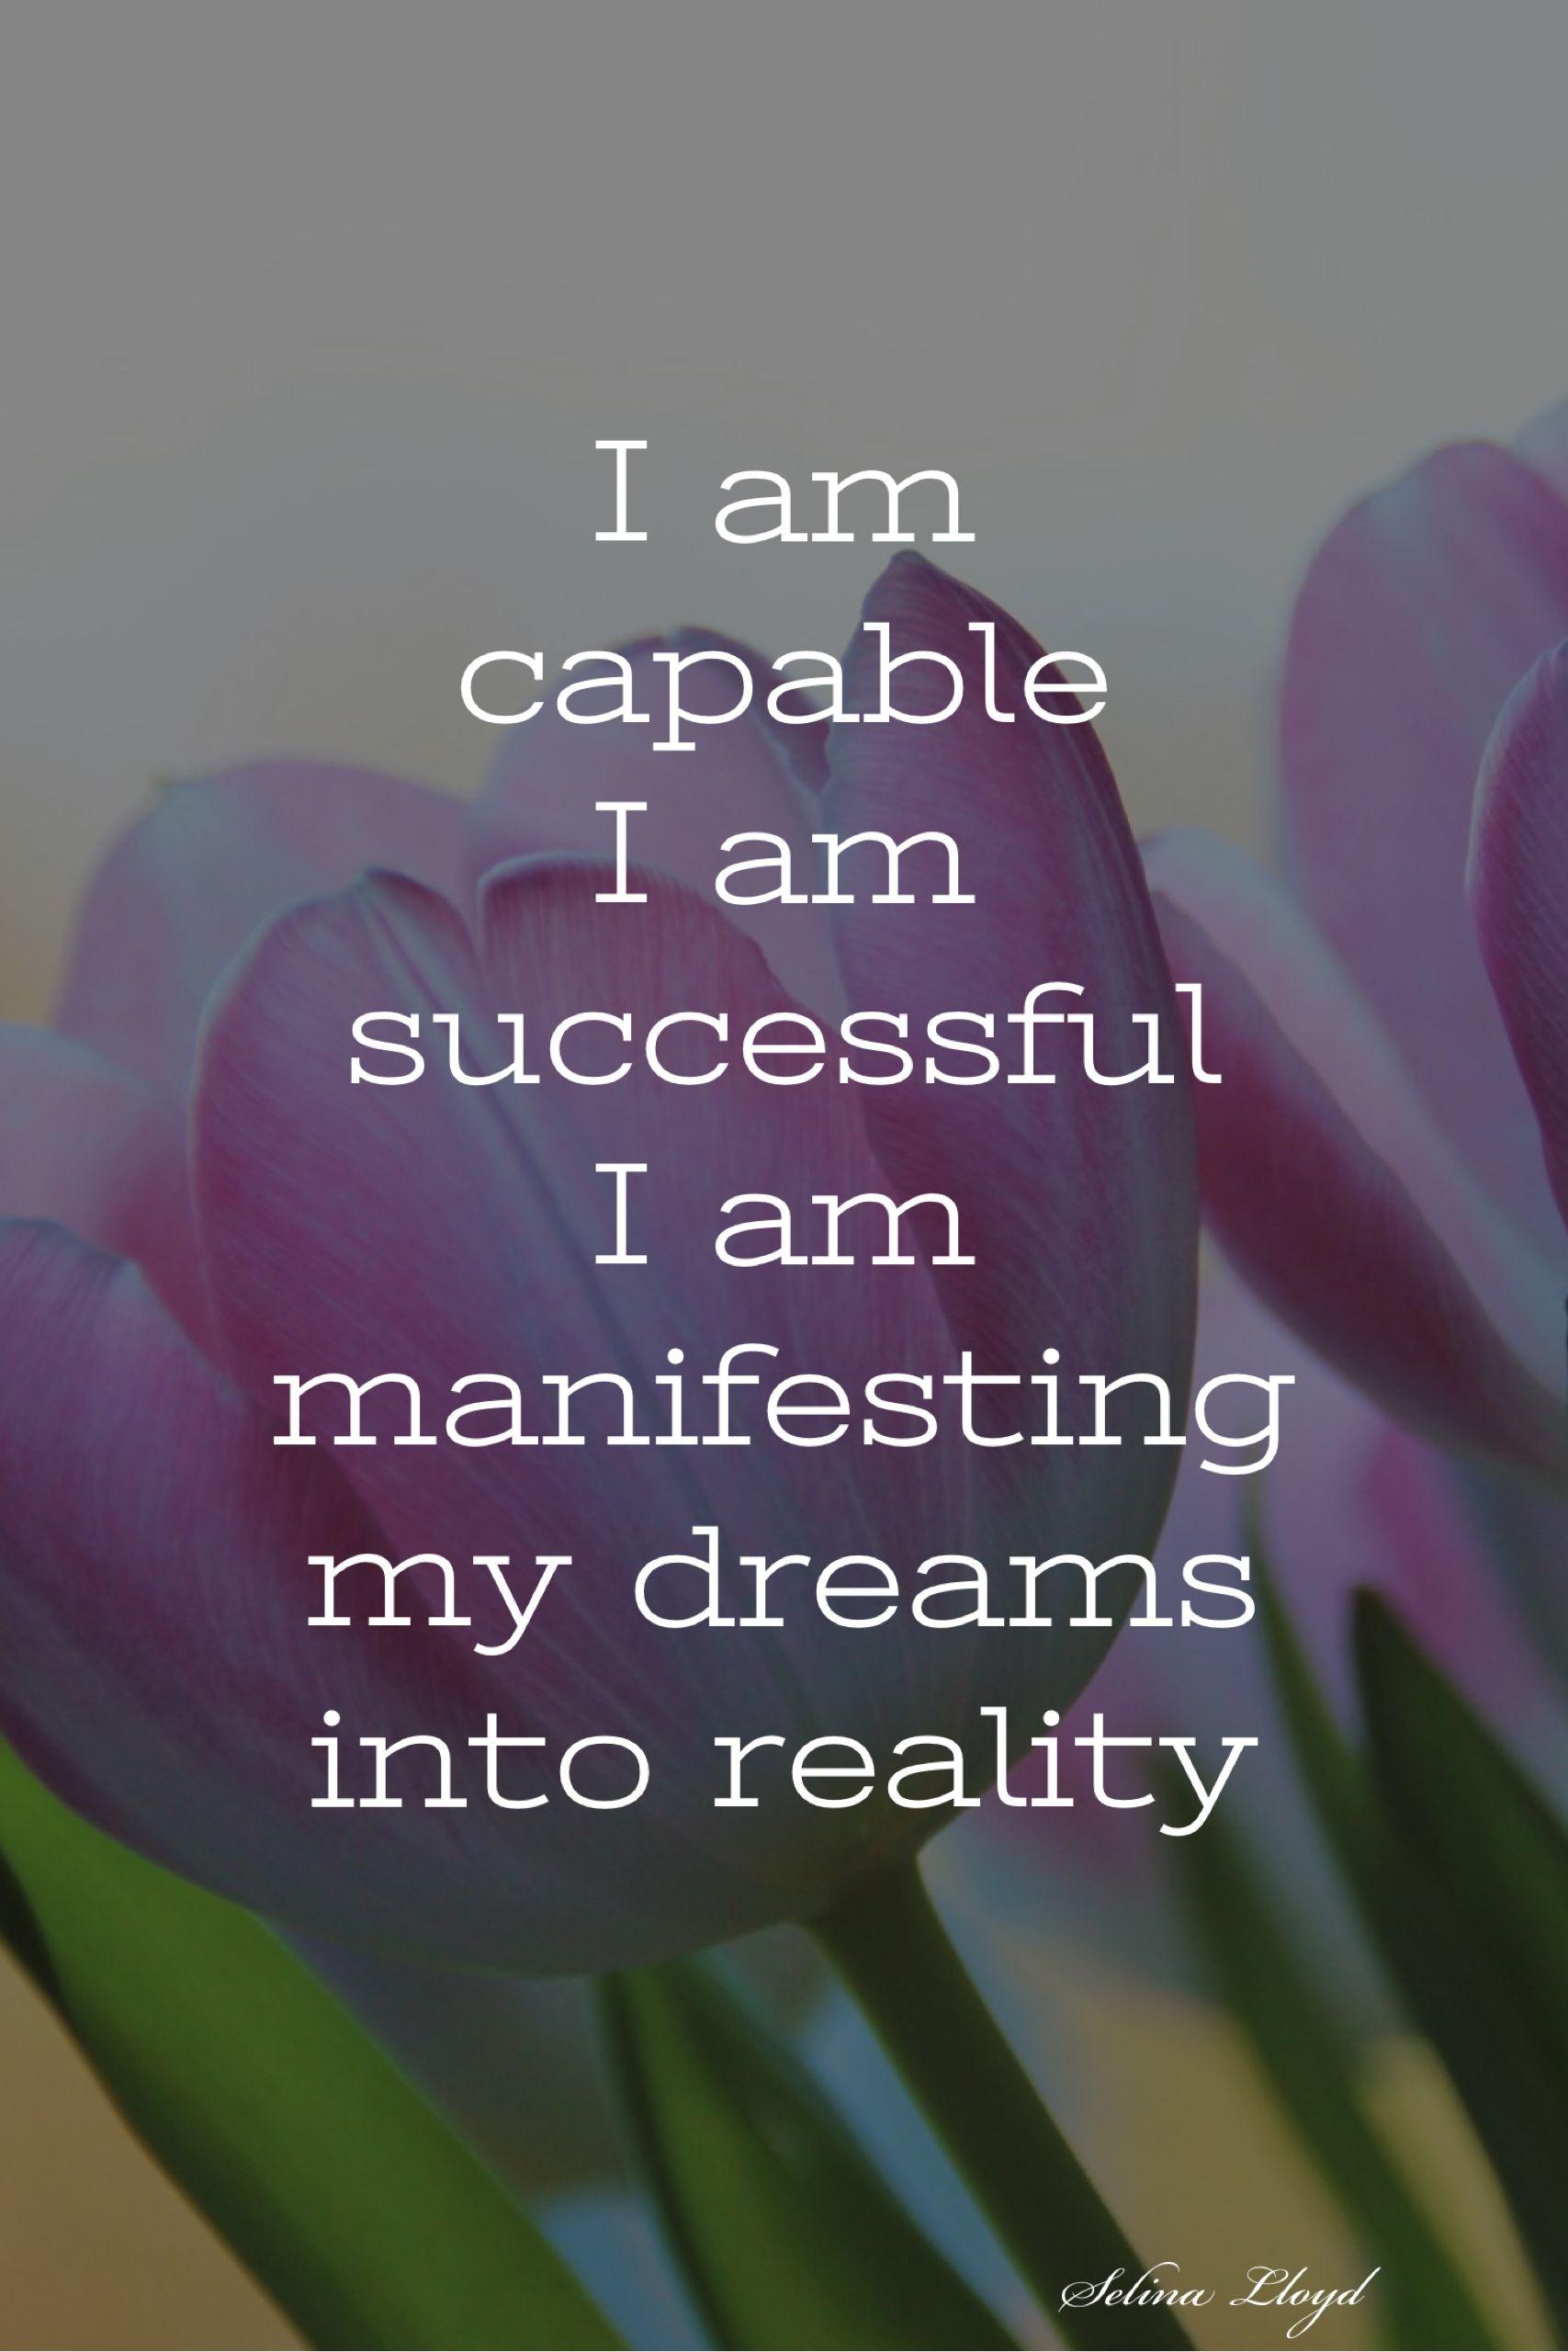 Affirmation: I am capable